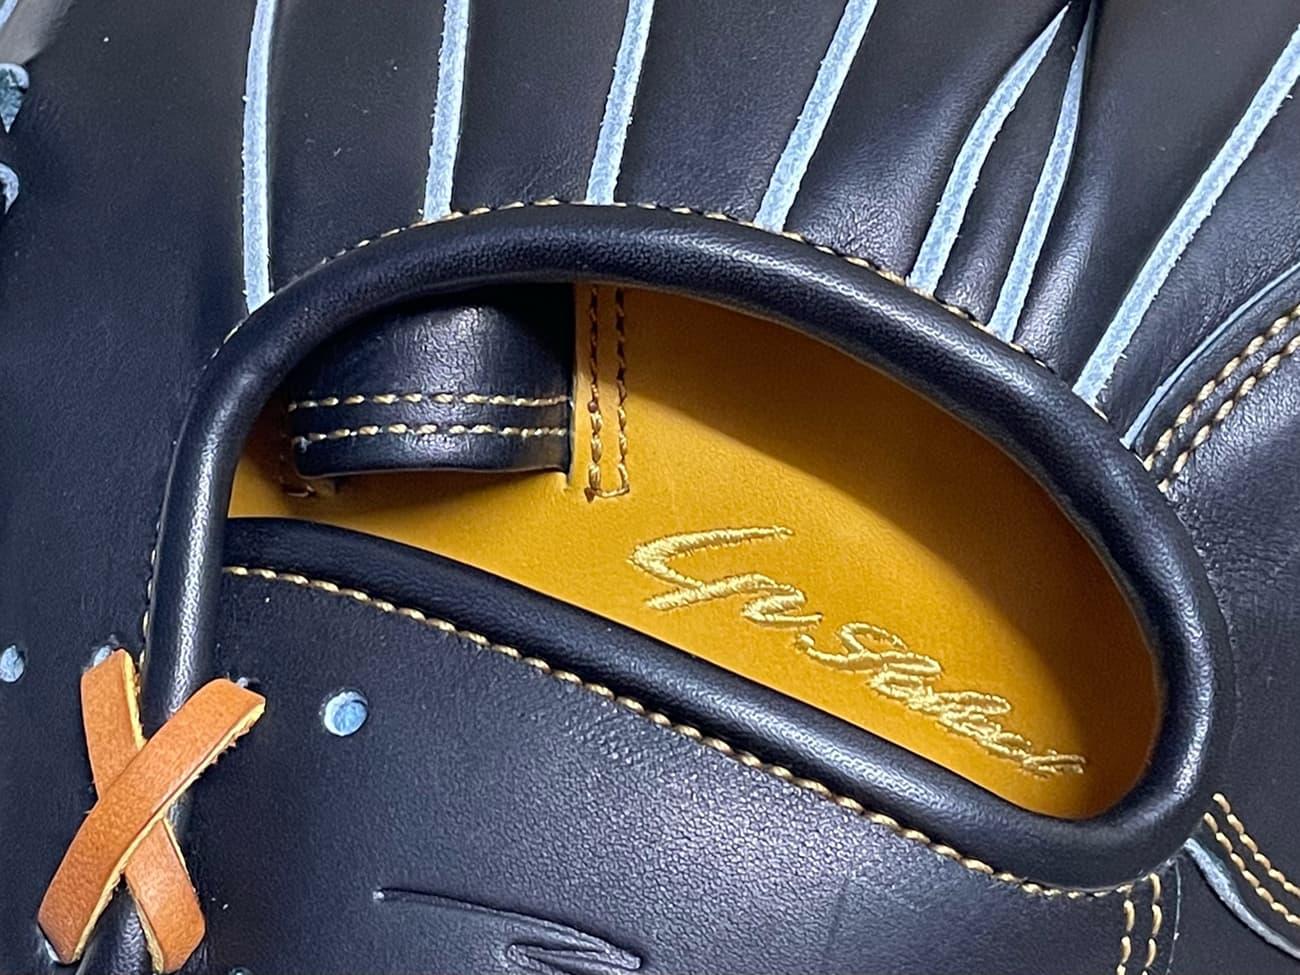 【IPセレクト】【十河モデル】硬式野球用グラブ(内野手・Luxury Collection 限定)刺繍と薬指リング